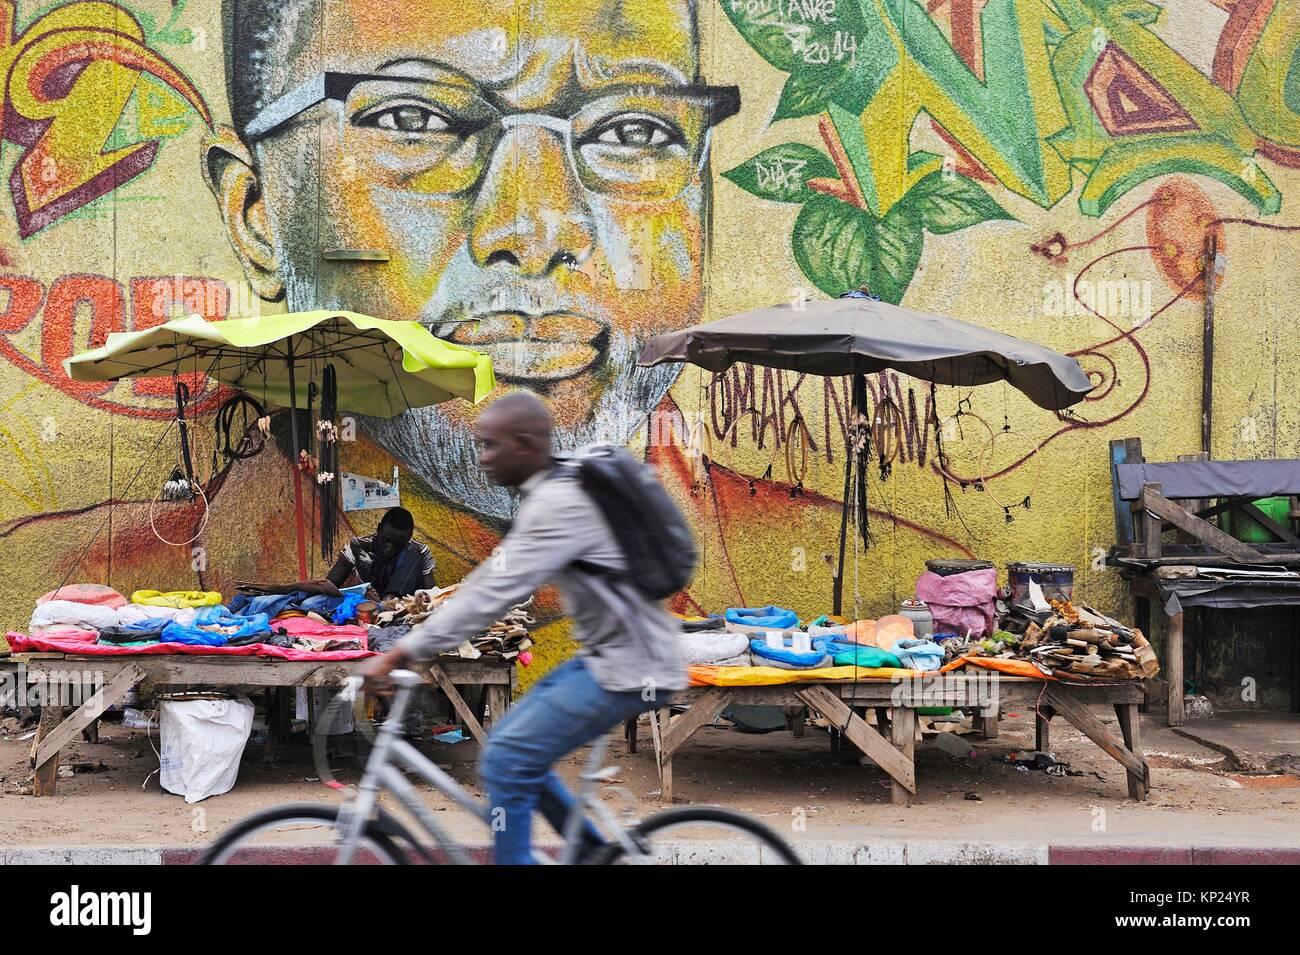 Dakar art senegal stock photos dakar art senegal stock for African mural painting